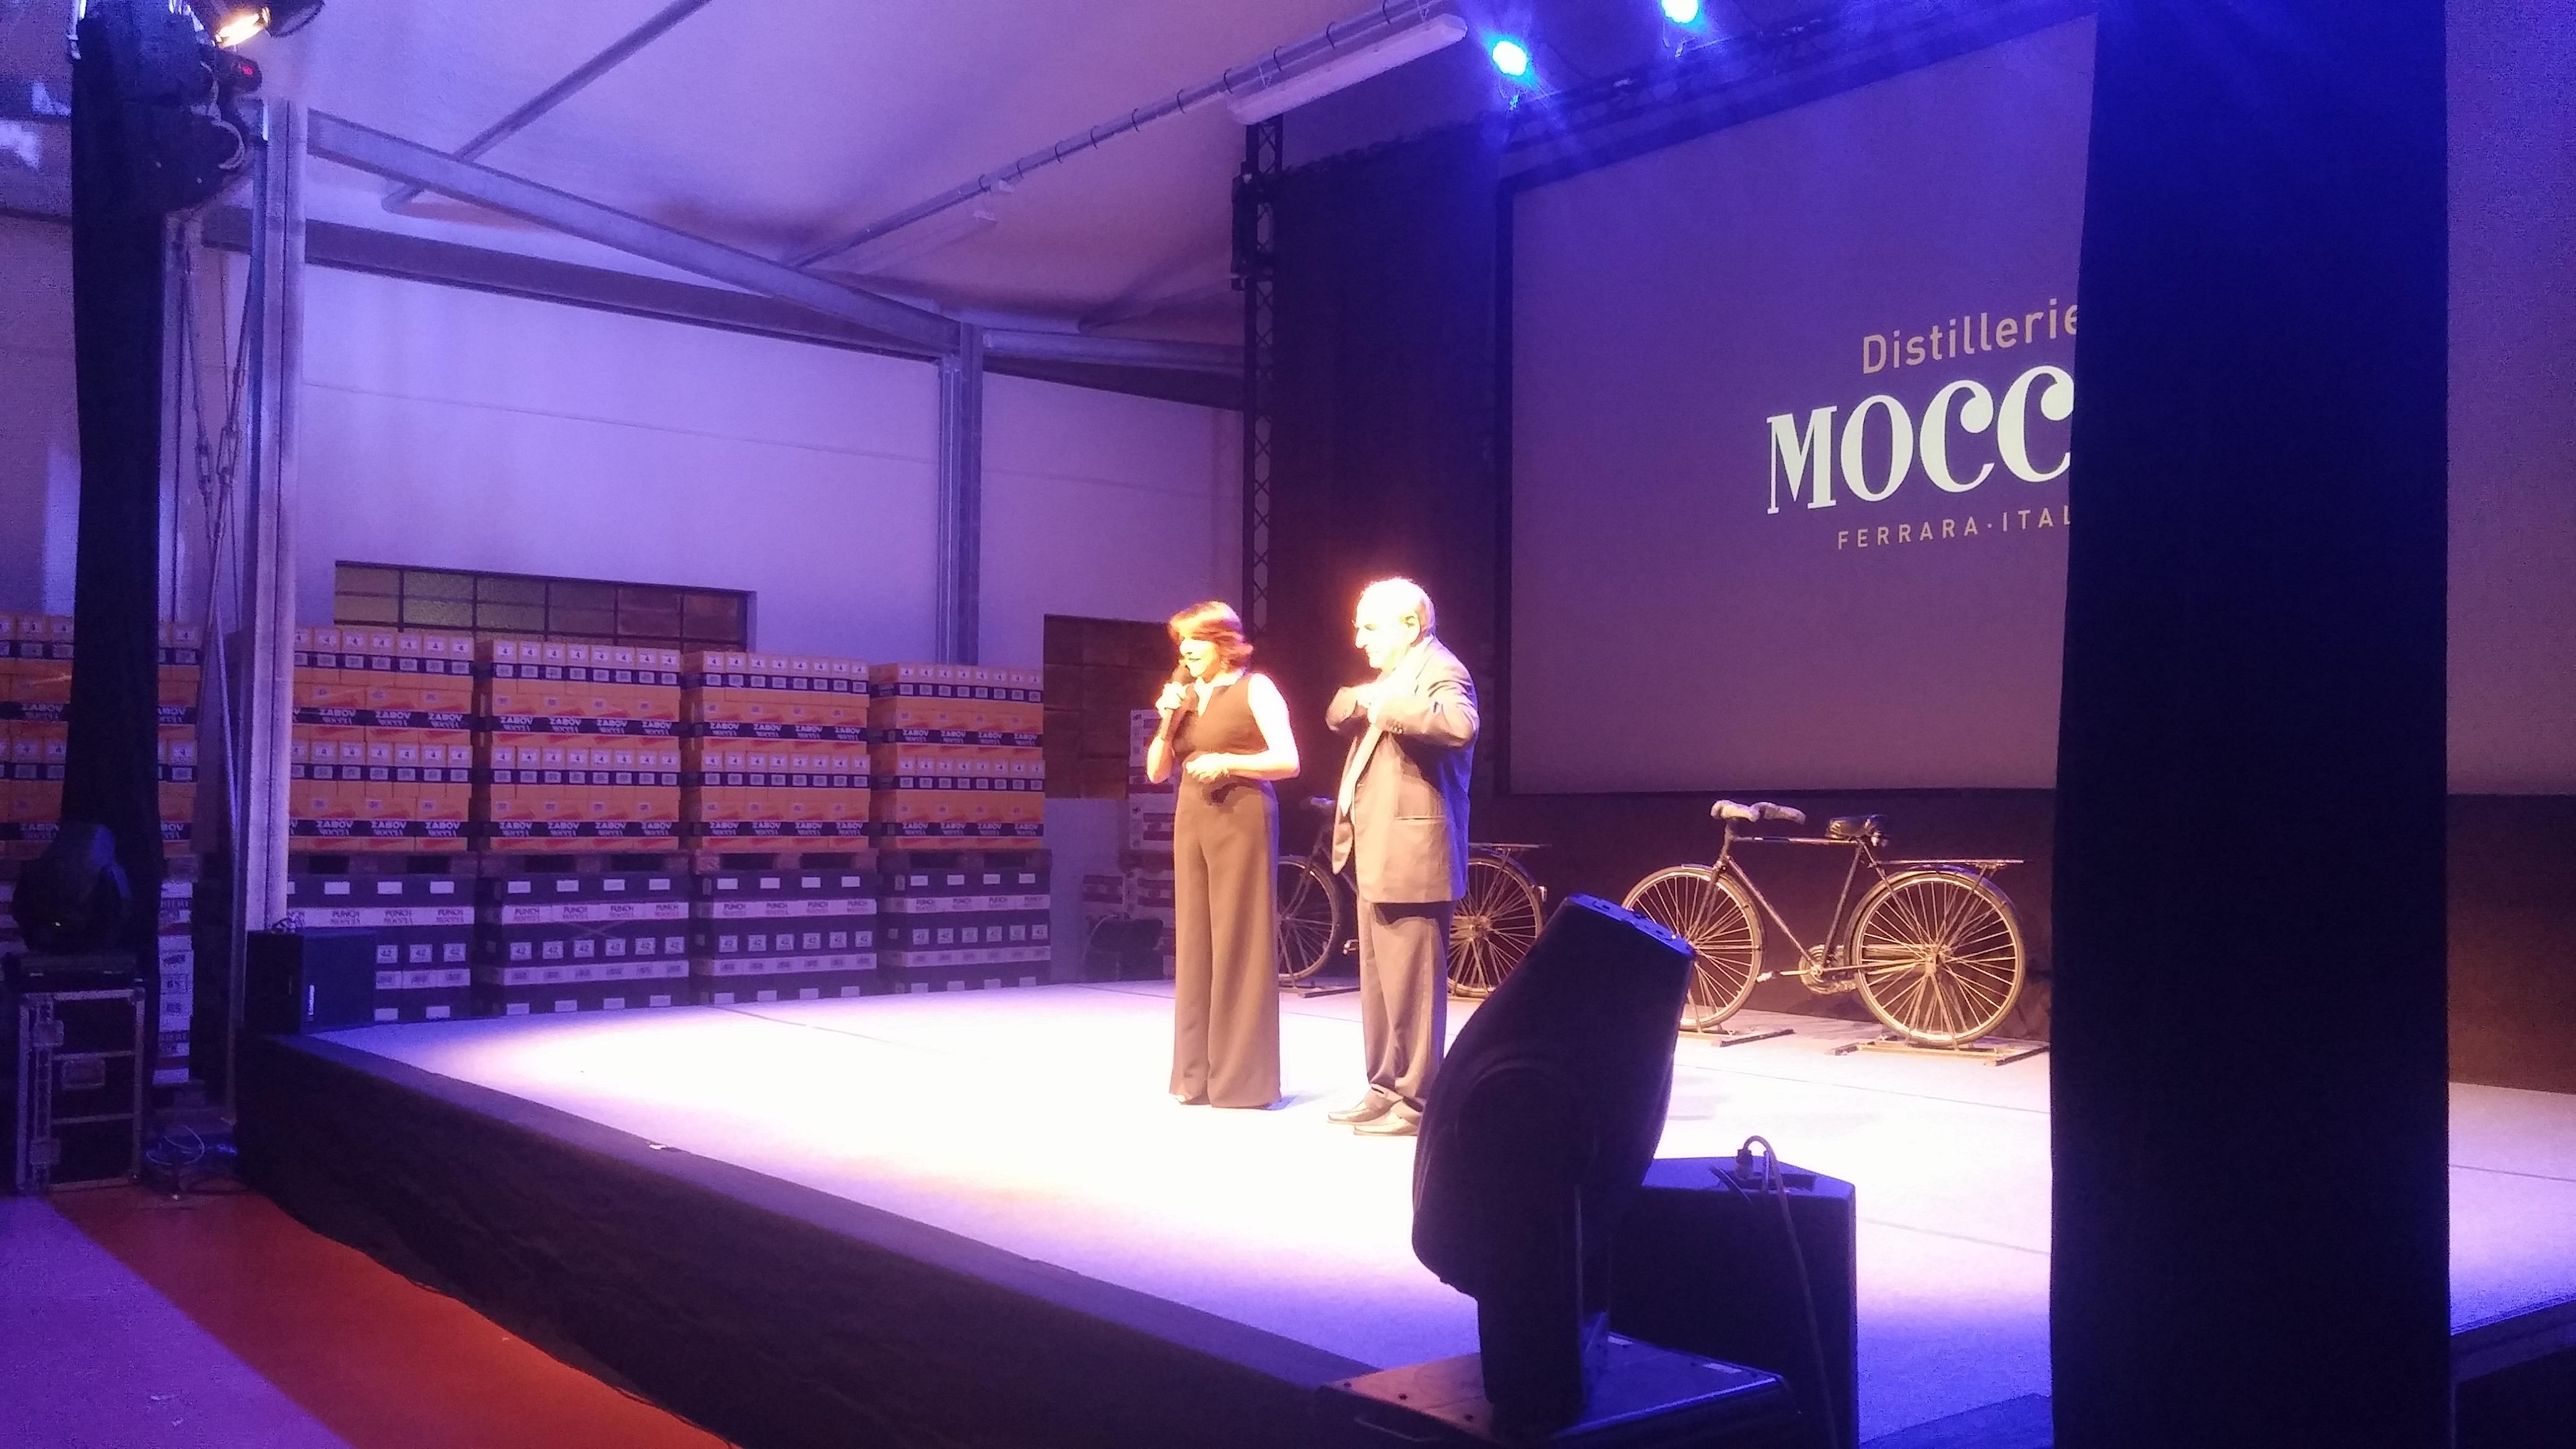 distillerie-moccia-1